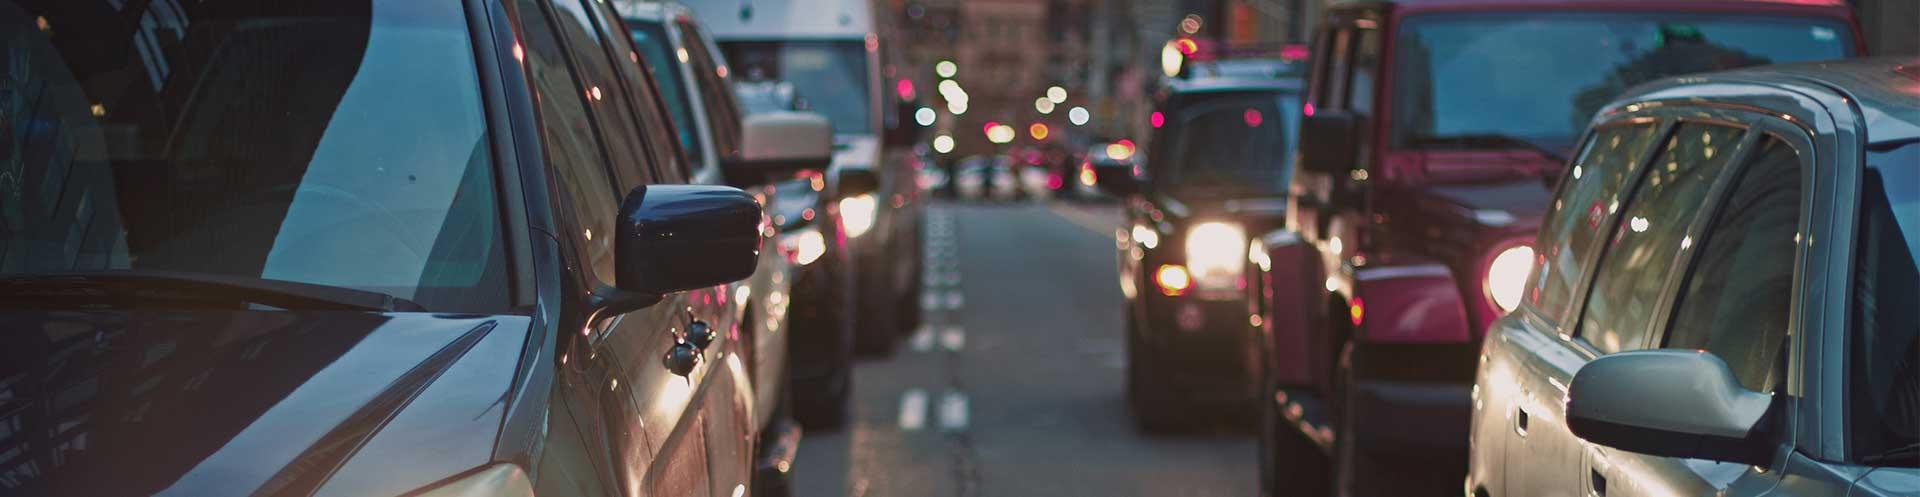 KSU professors use DOT cameras to make intersections safer